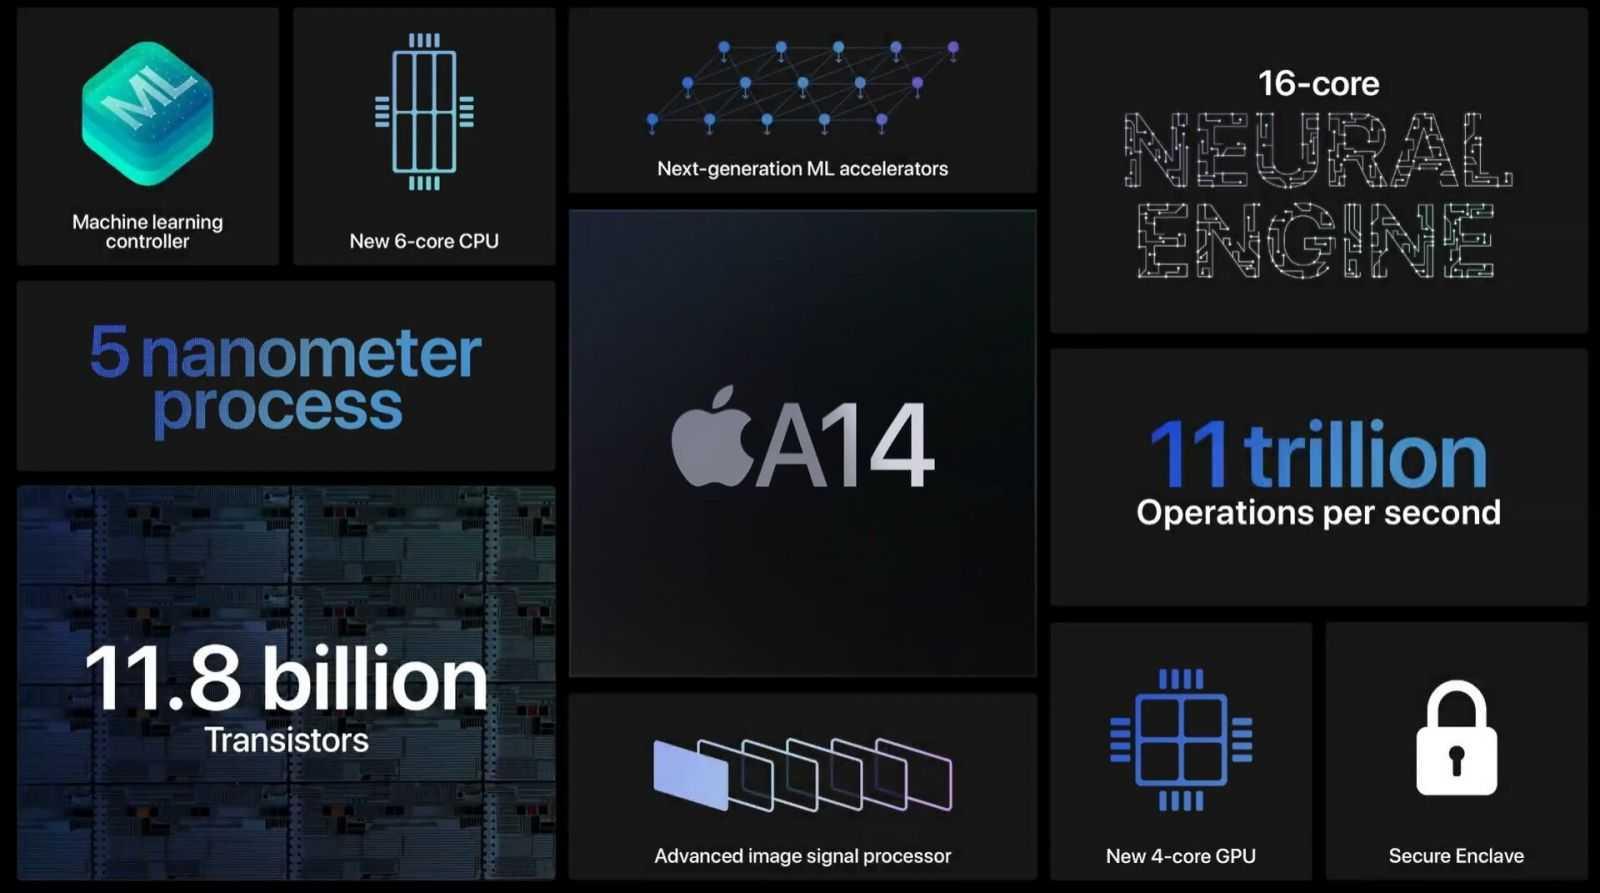 Обзор iPhone 12 Pro: мой любимый размер и цвет (csm Apple neues iPad Air 4 gelauncht 4 9e780a9a7b)